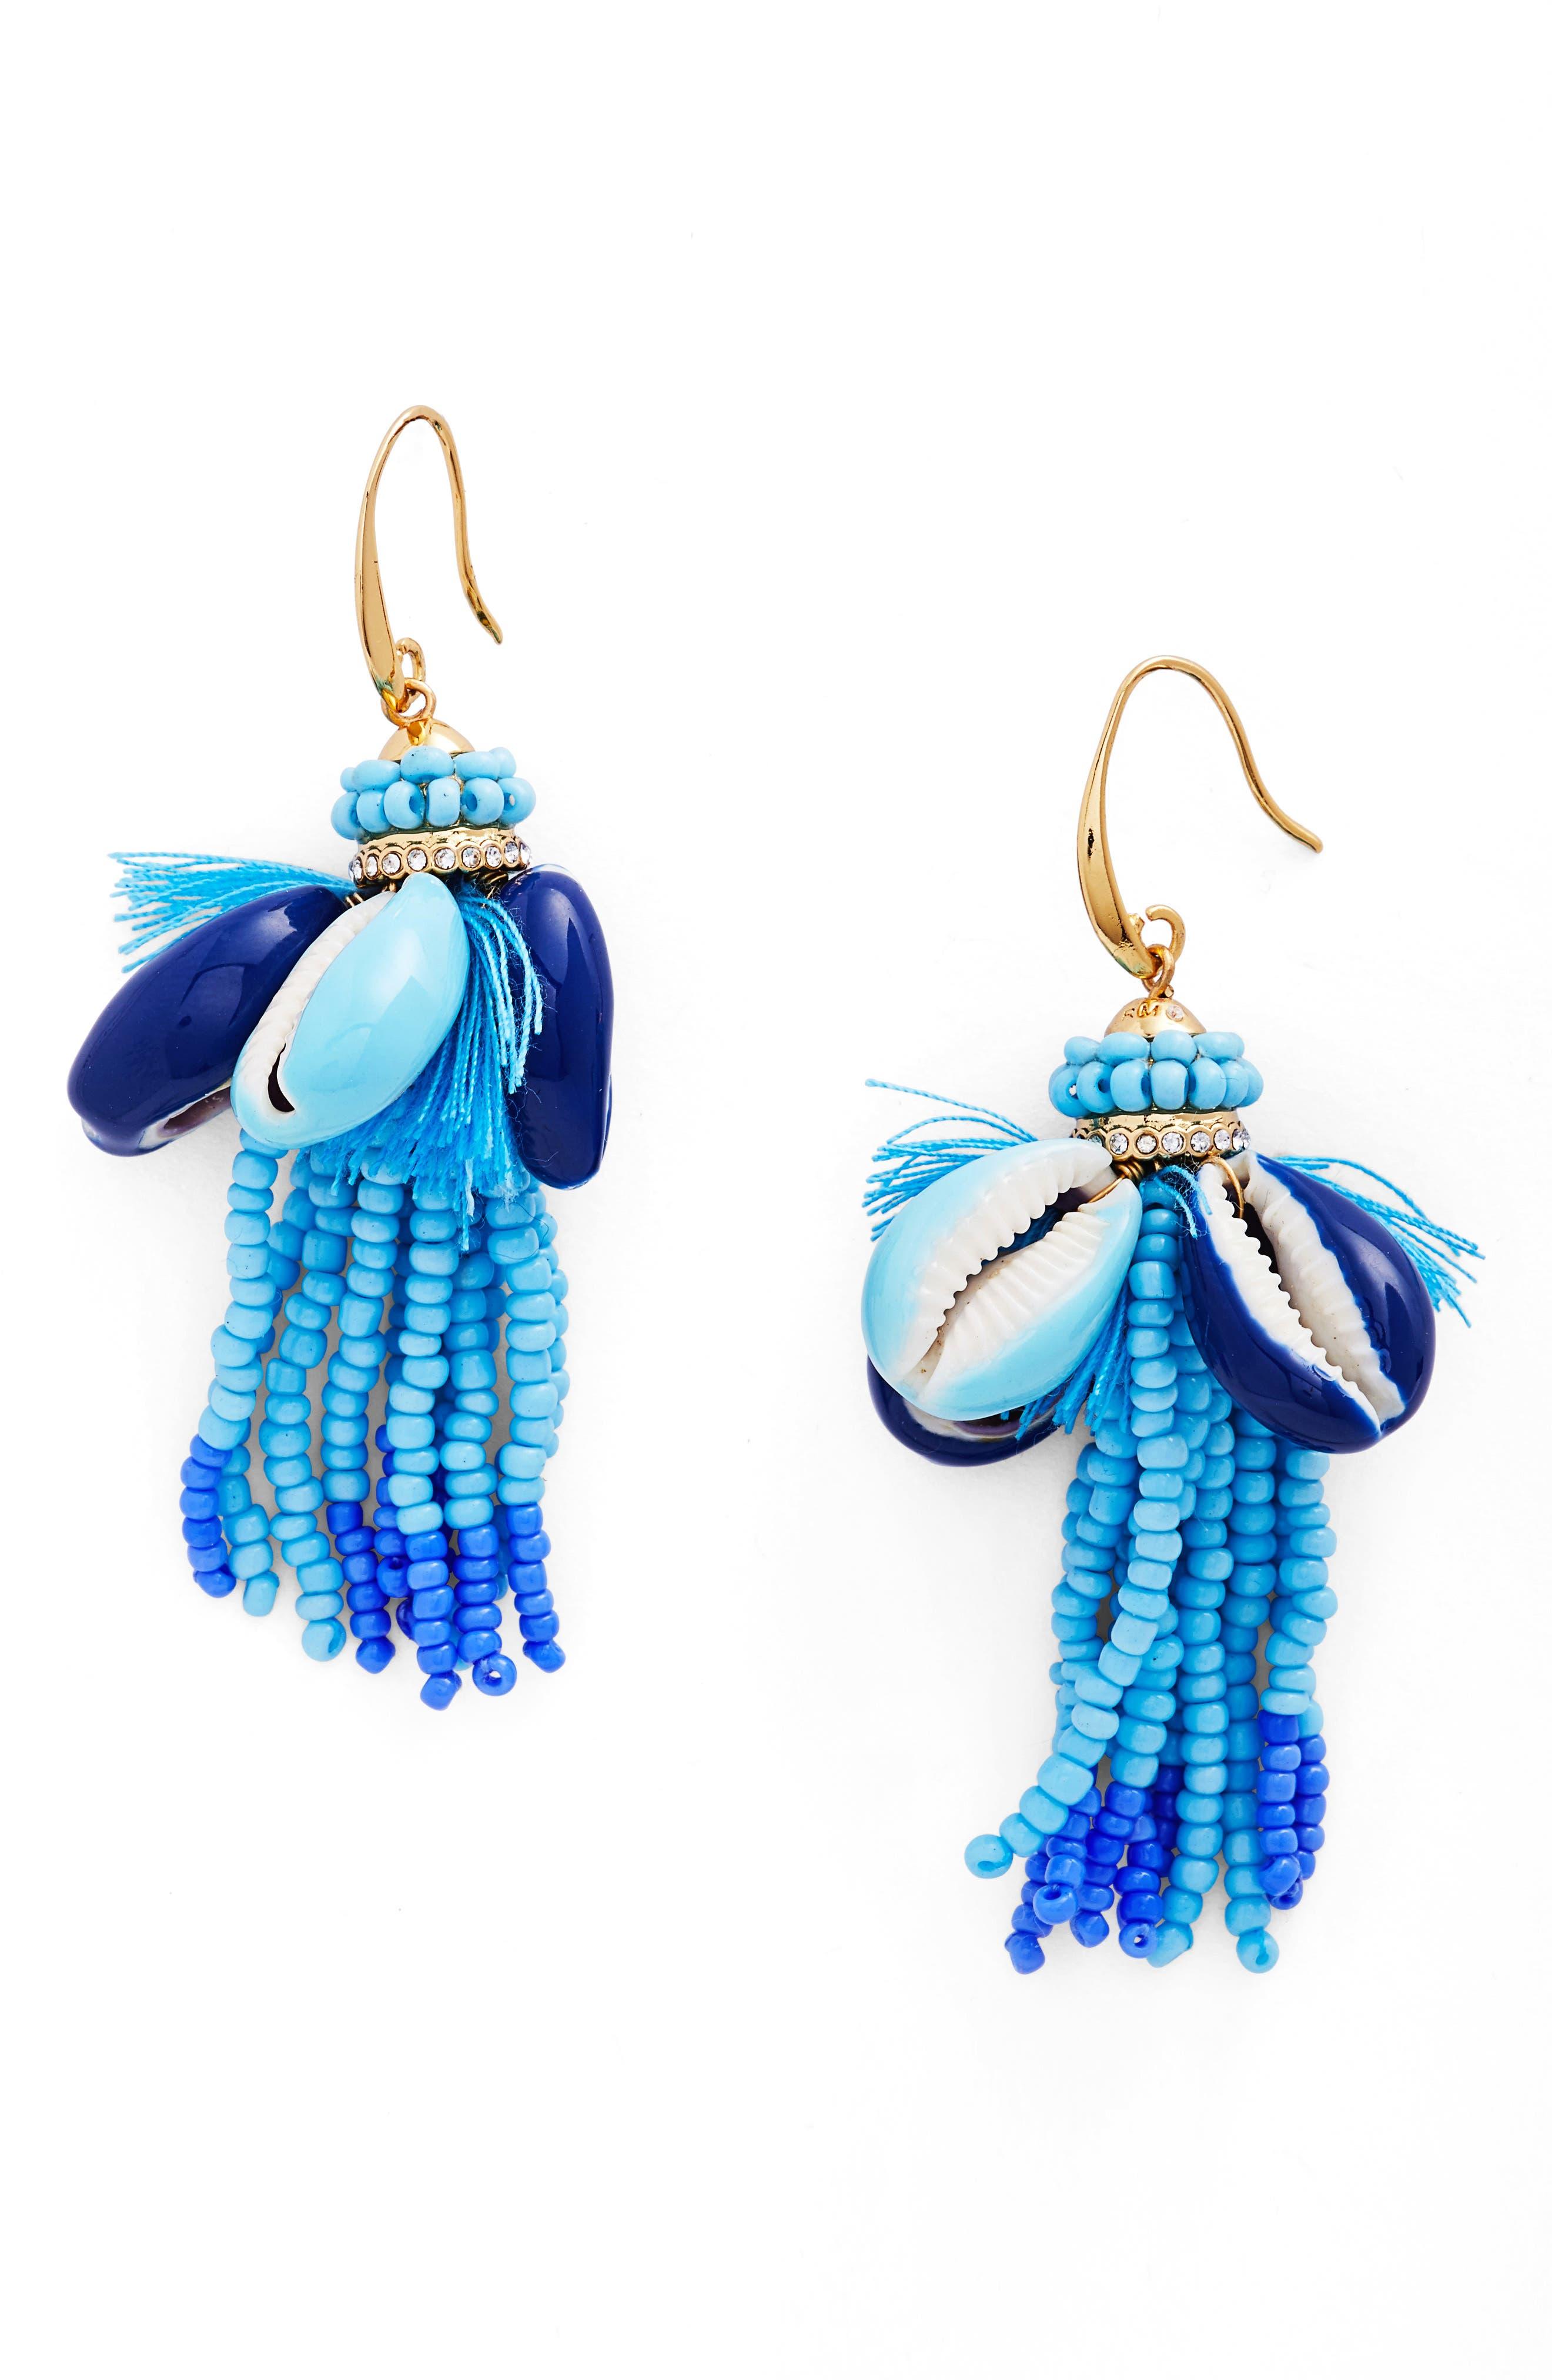 Lola Seed Bead Tassel Earrings,                             Main thumbnail 1, color,                             400